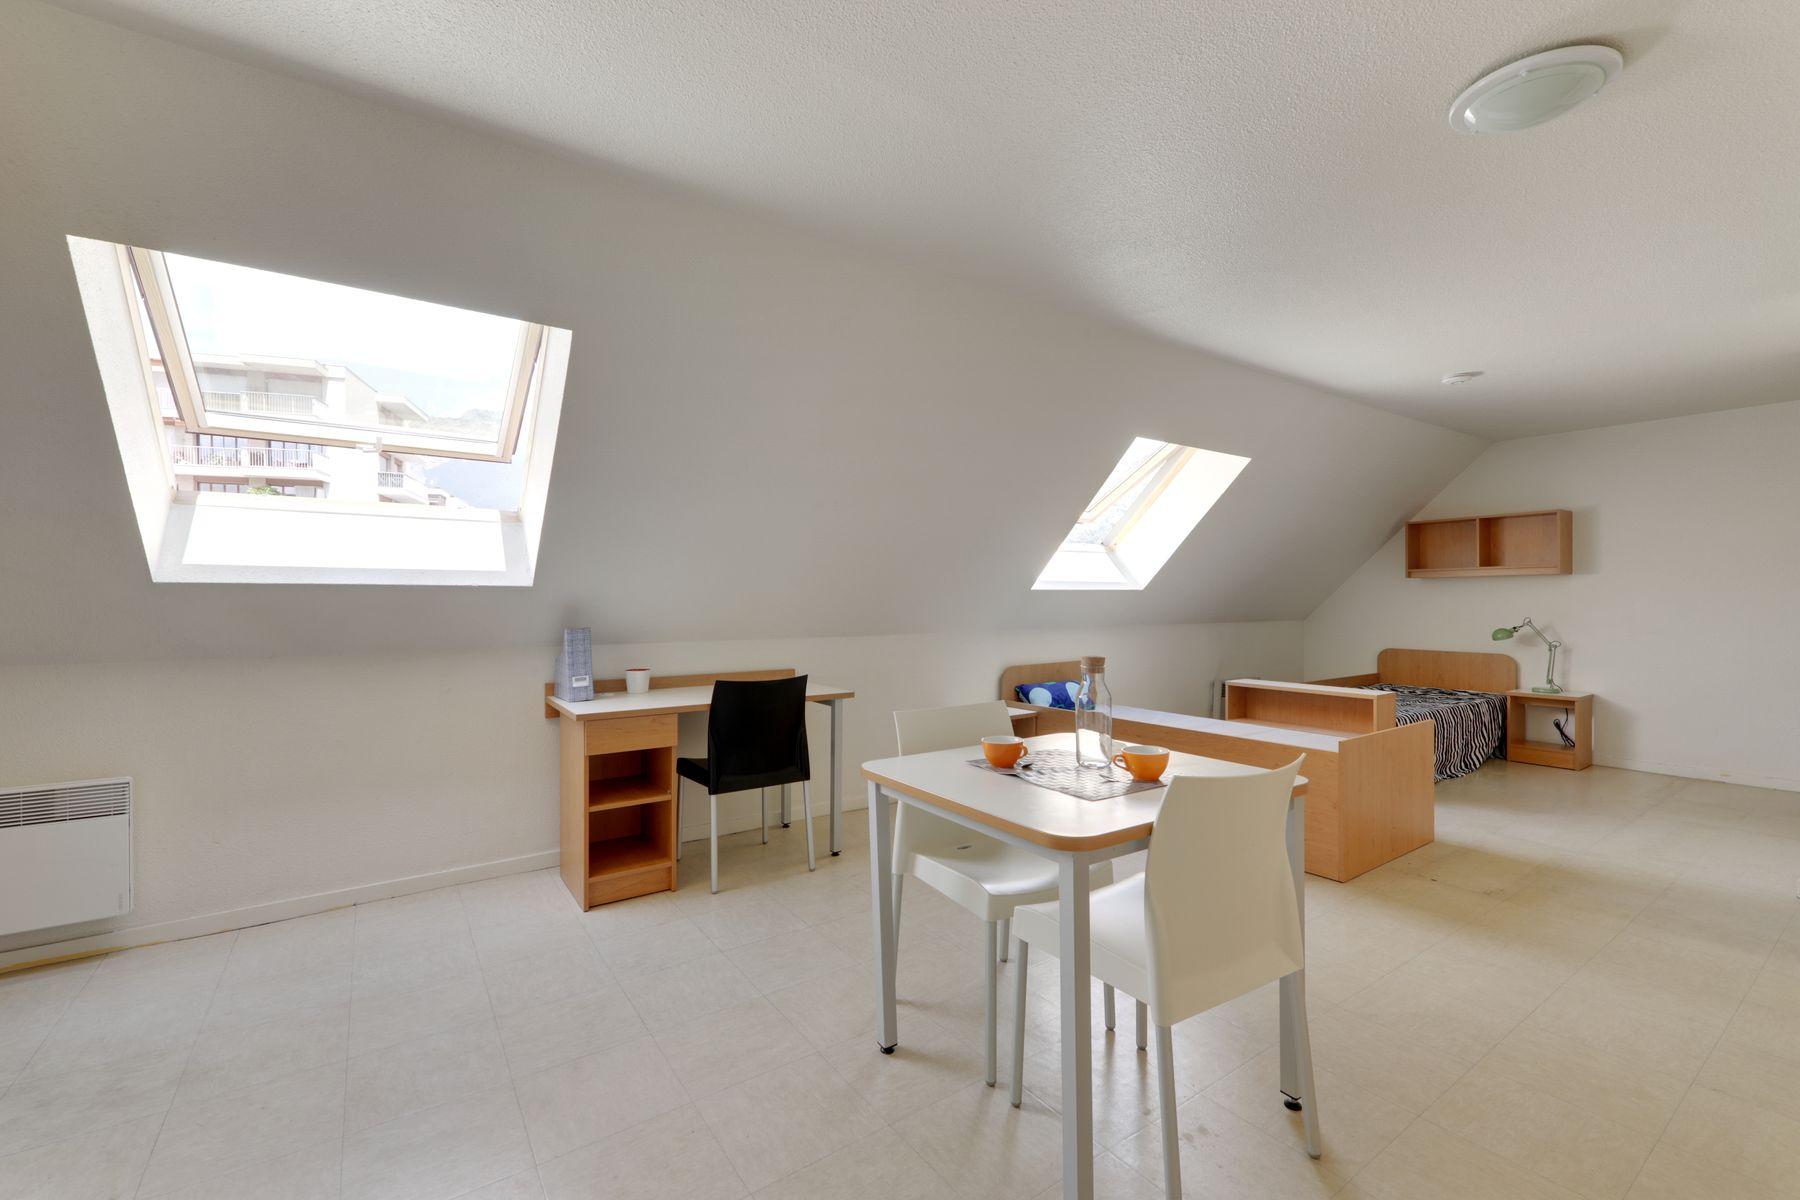 LOGIFAC résidence étudiante Anthoard Grenoble studio mansardé